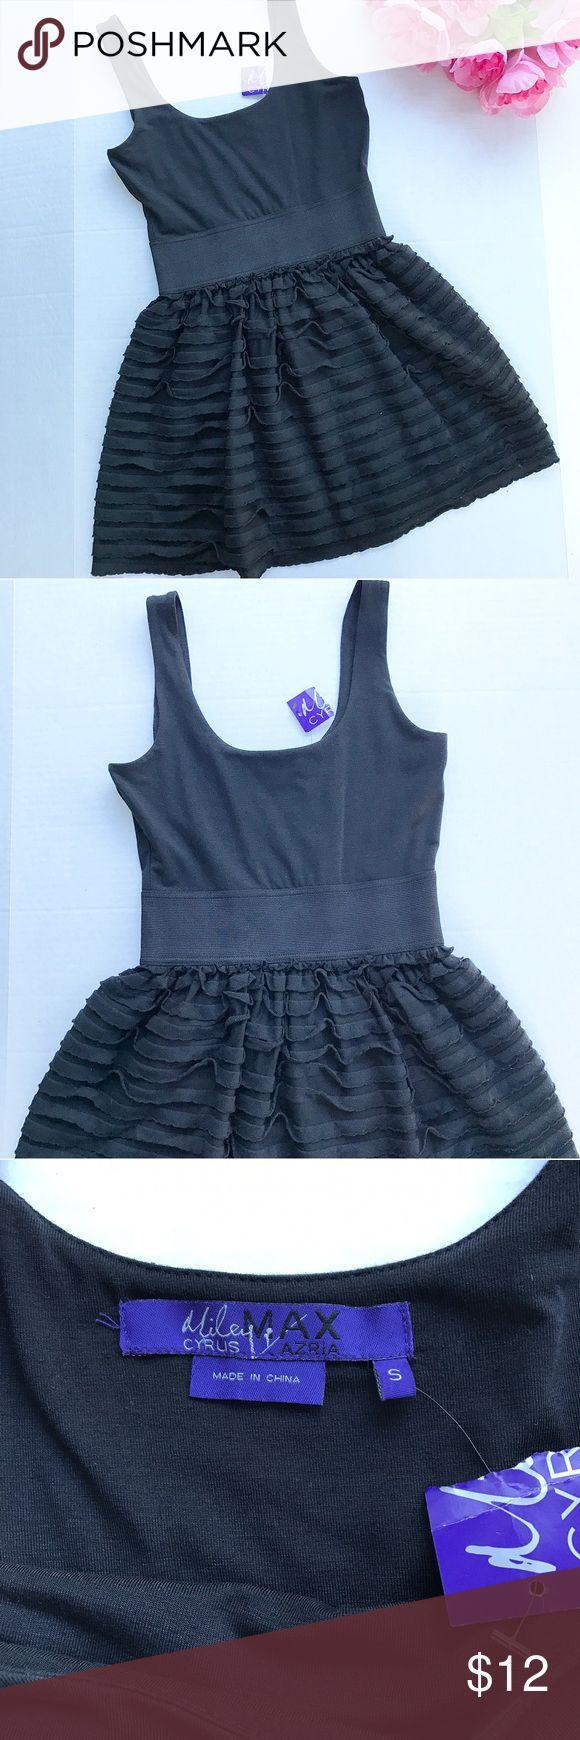 NWT Max Azria x Miley Cyrus little black dress. NWT Miley Cyrus for Max Azria little black dress. Size Small. Miley Cyrus & Max Azria Dresses